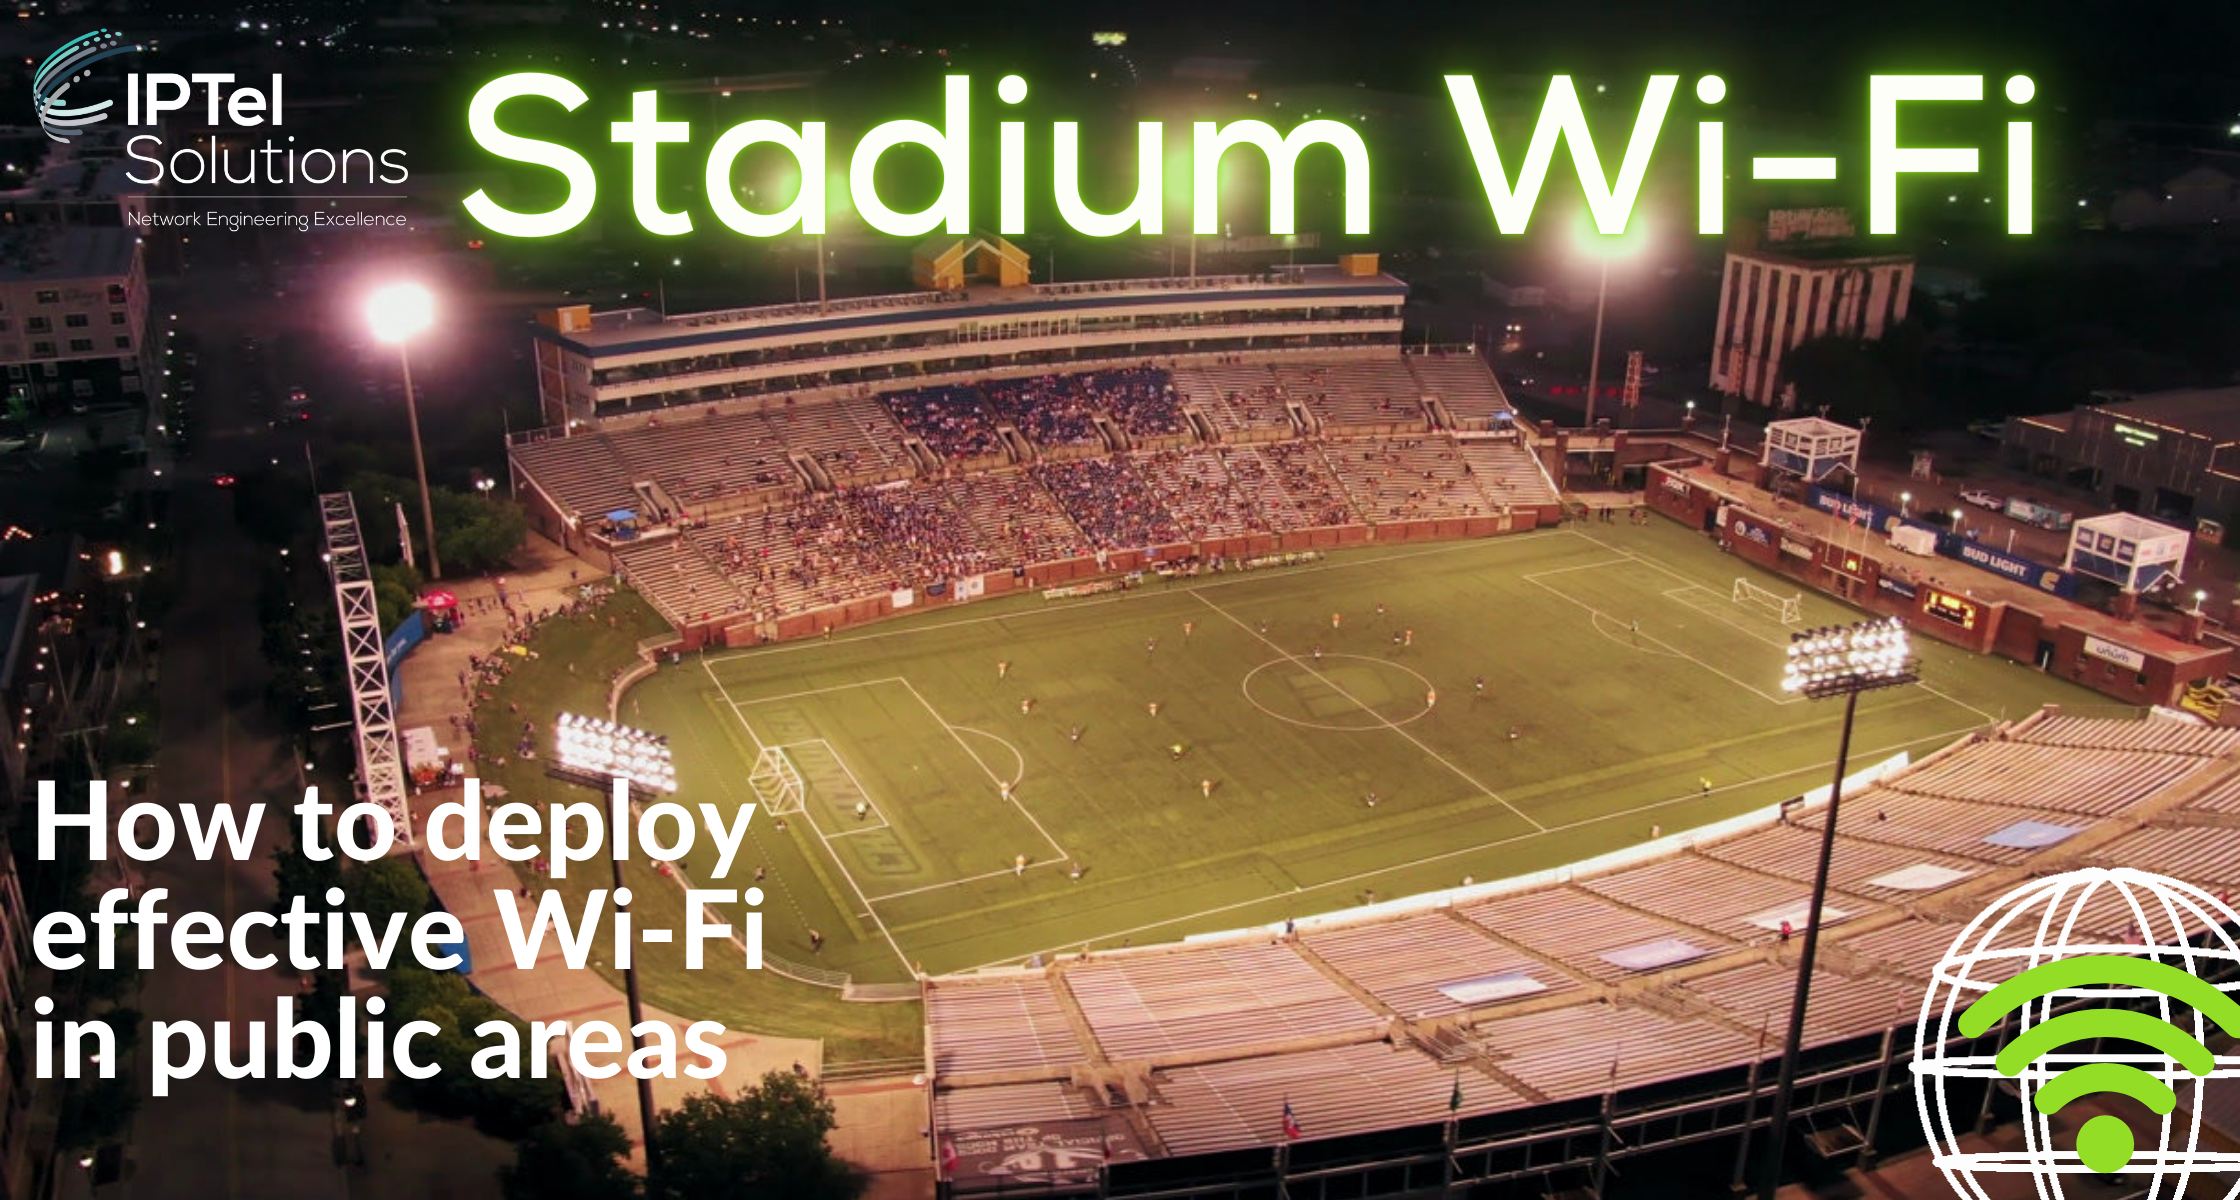 Stadium Wi-Fi